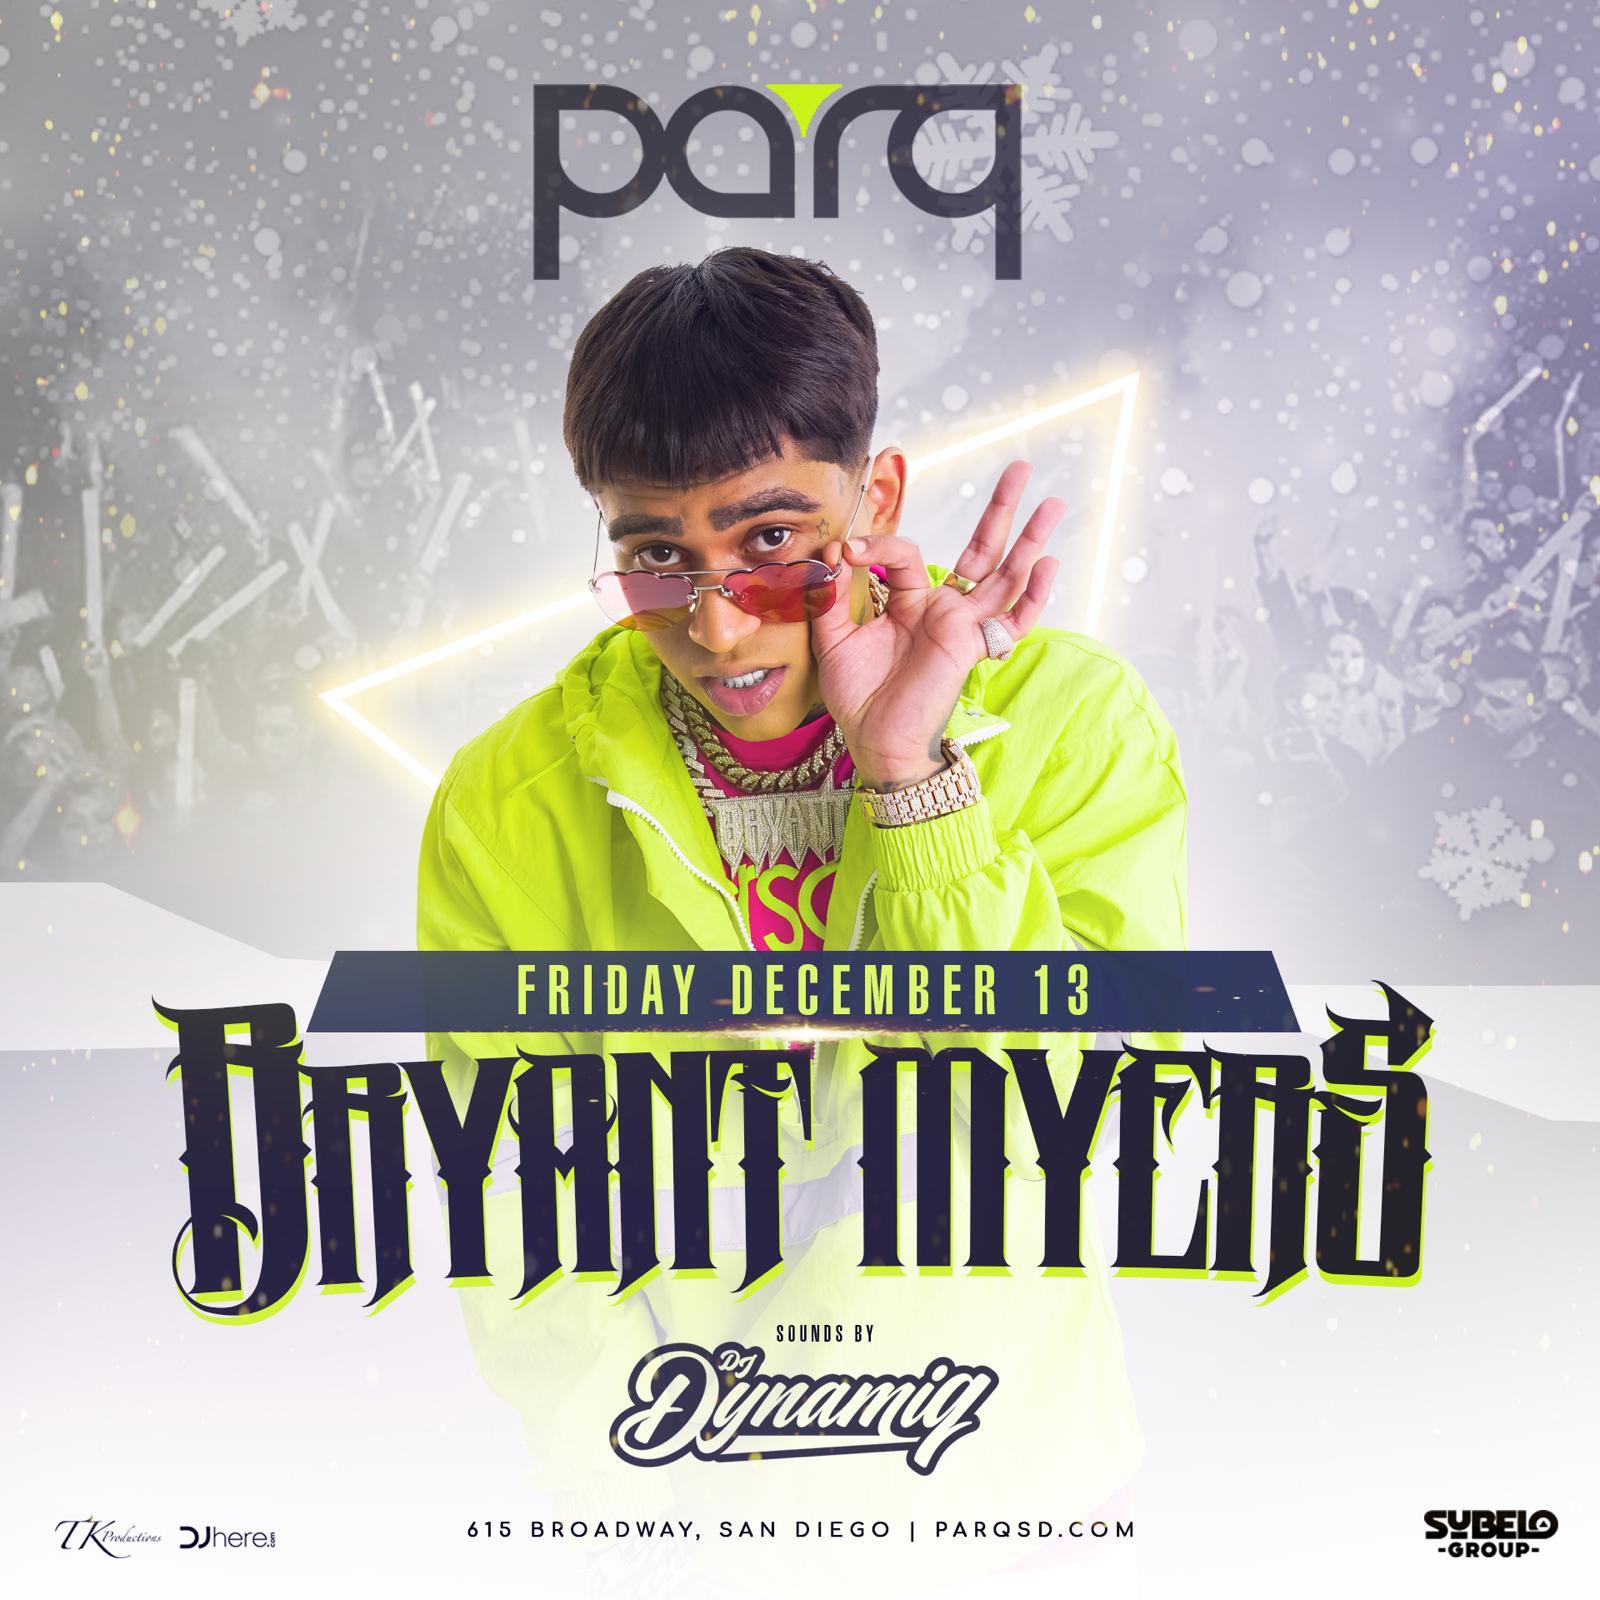 Bryant Myers At Parq Nightclub Dec. 13th